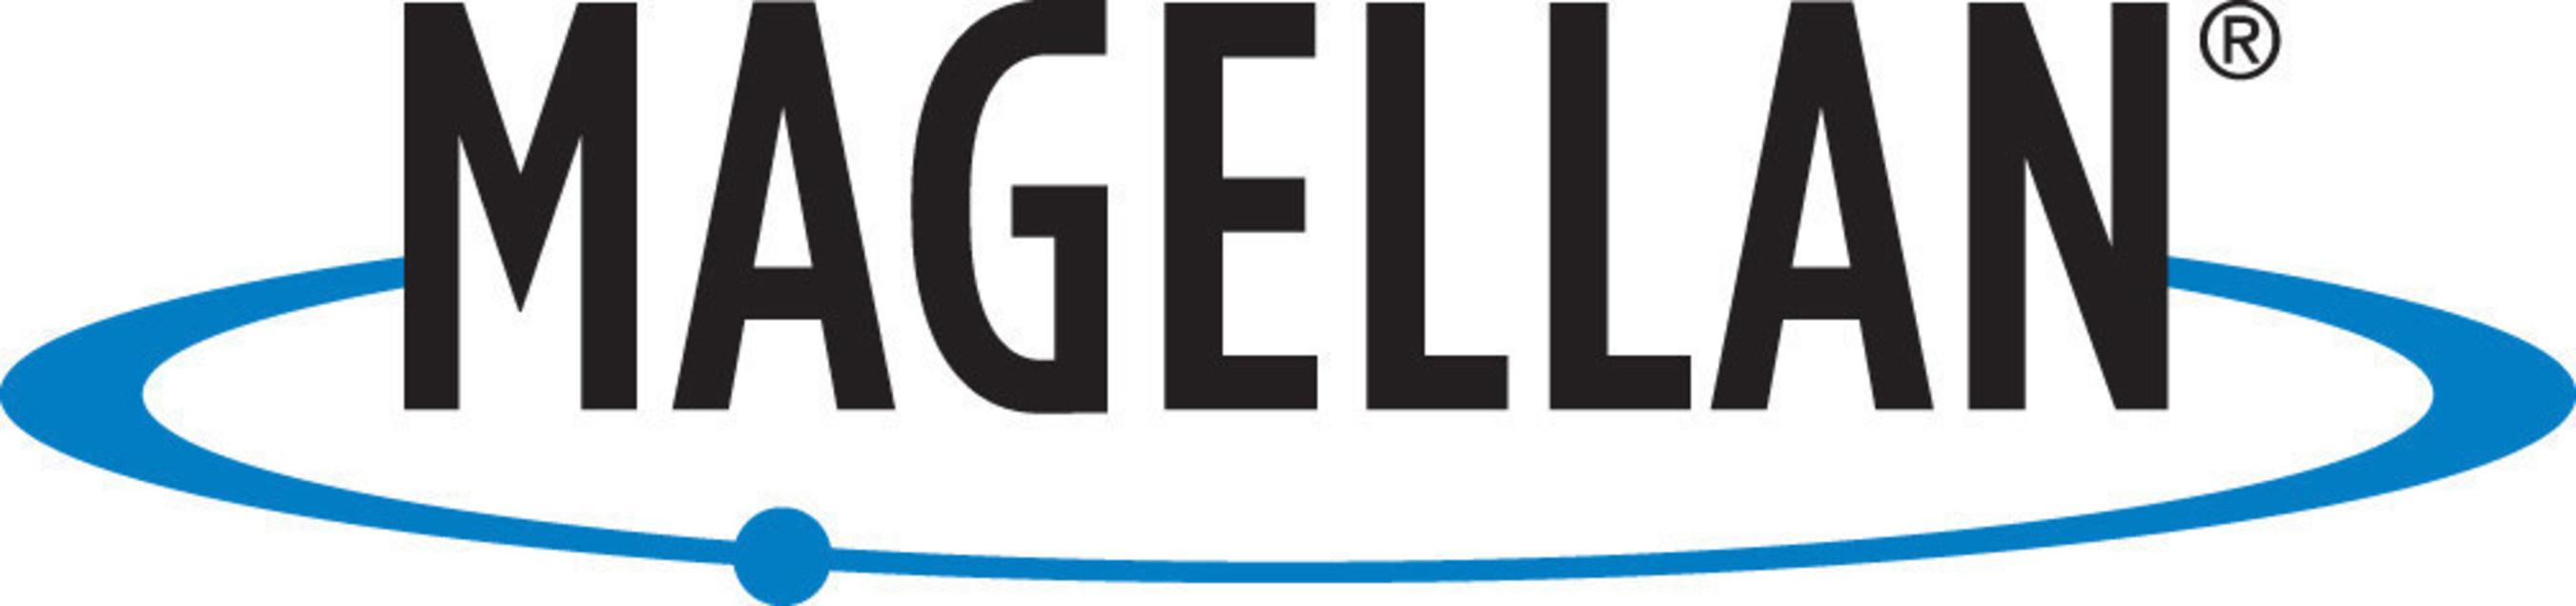 Magellan and Abalta Technologies Announce Strategic Partnership at Auto Shanghai 2015